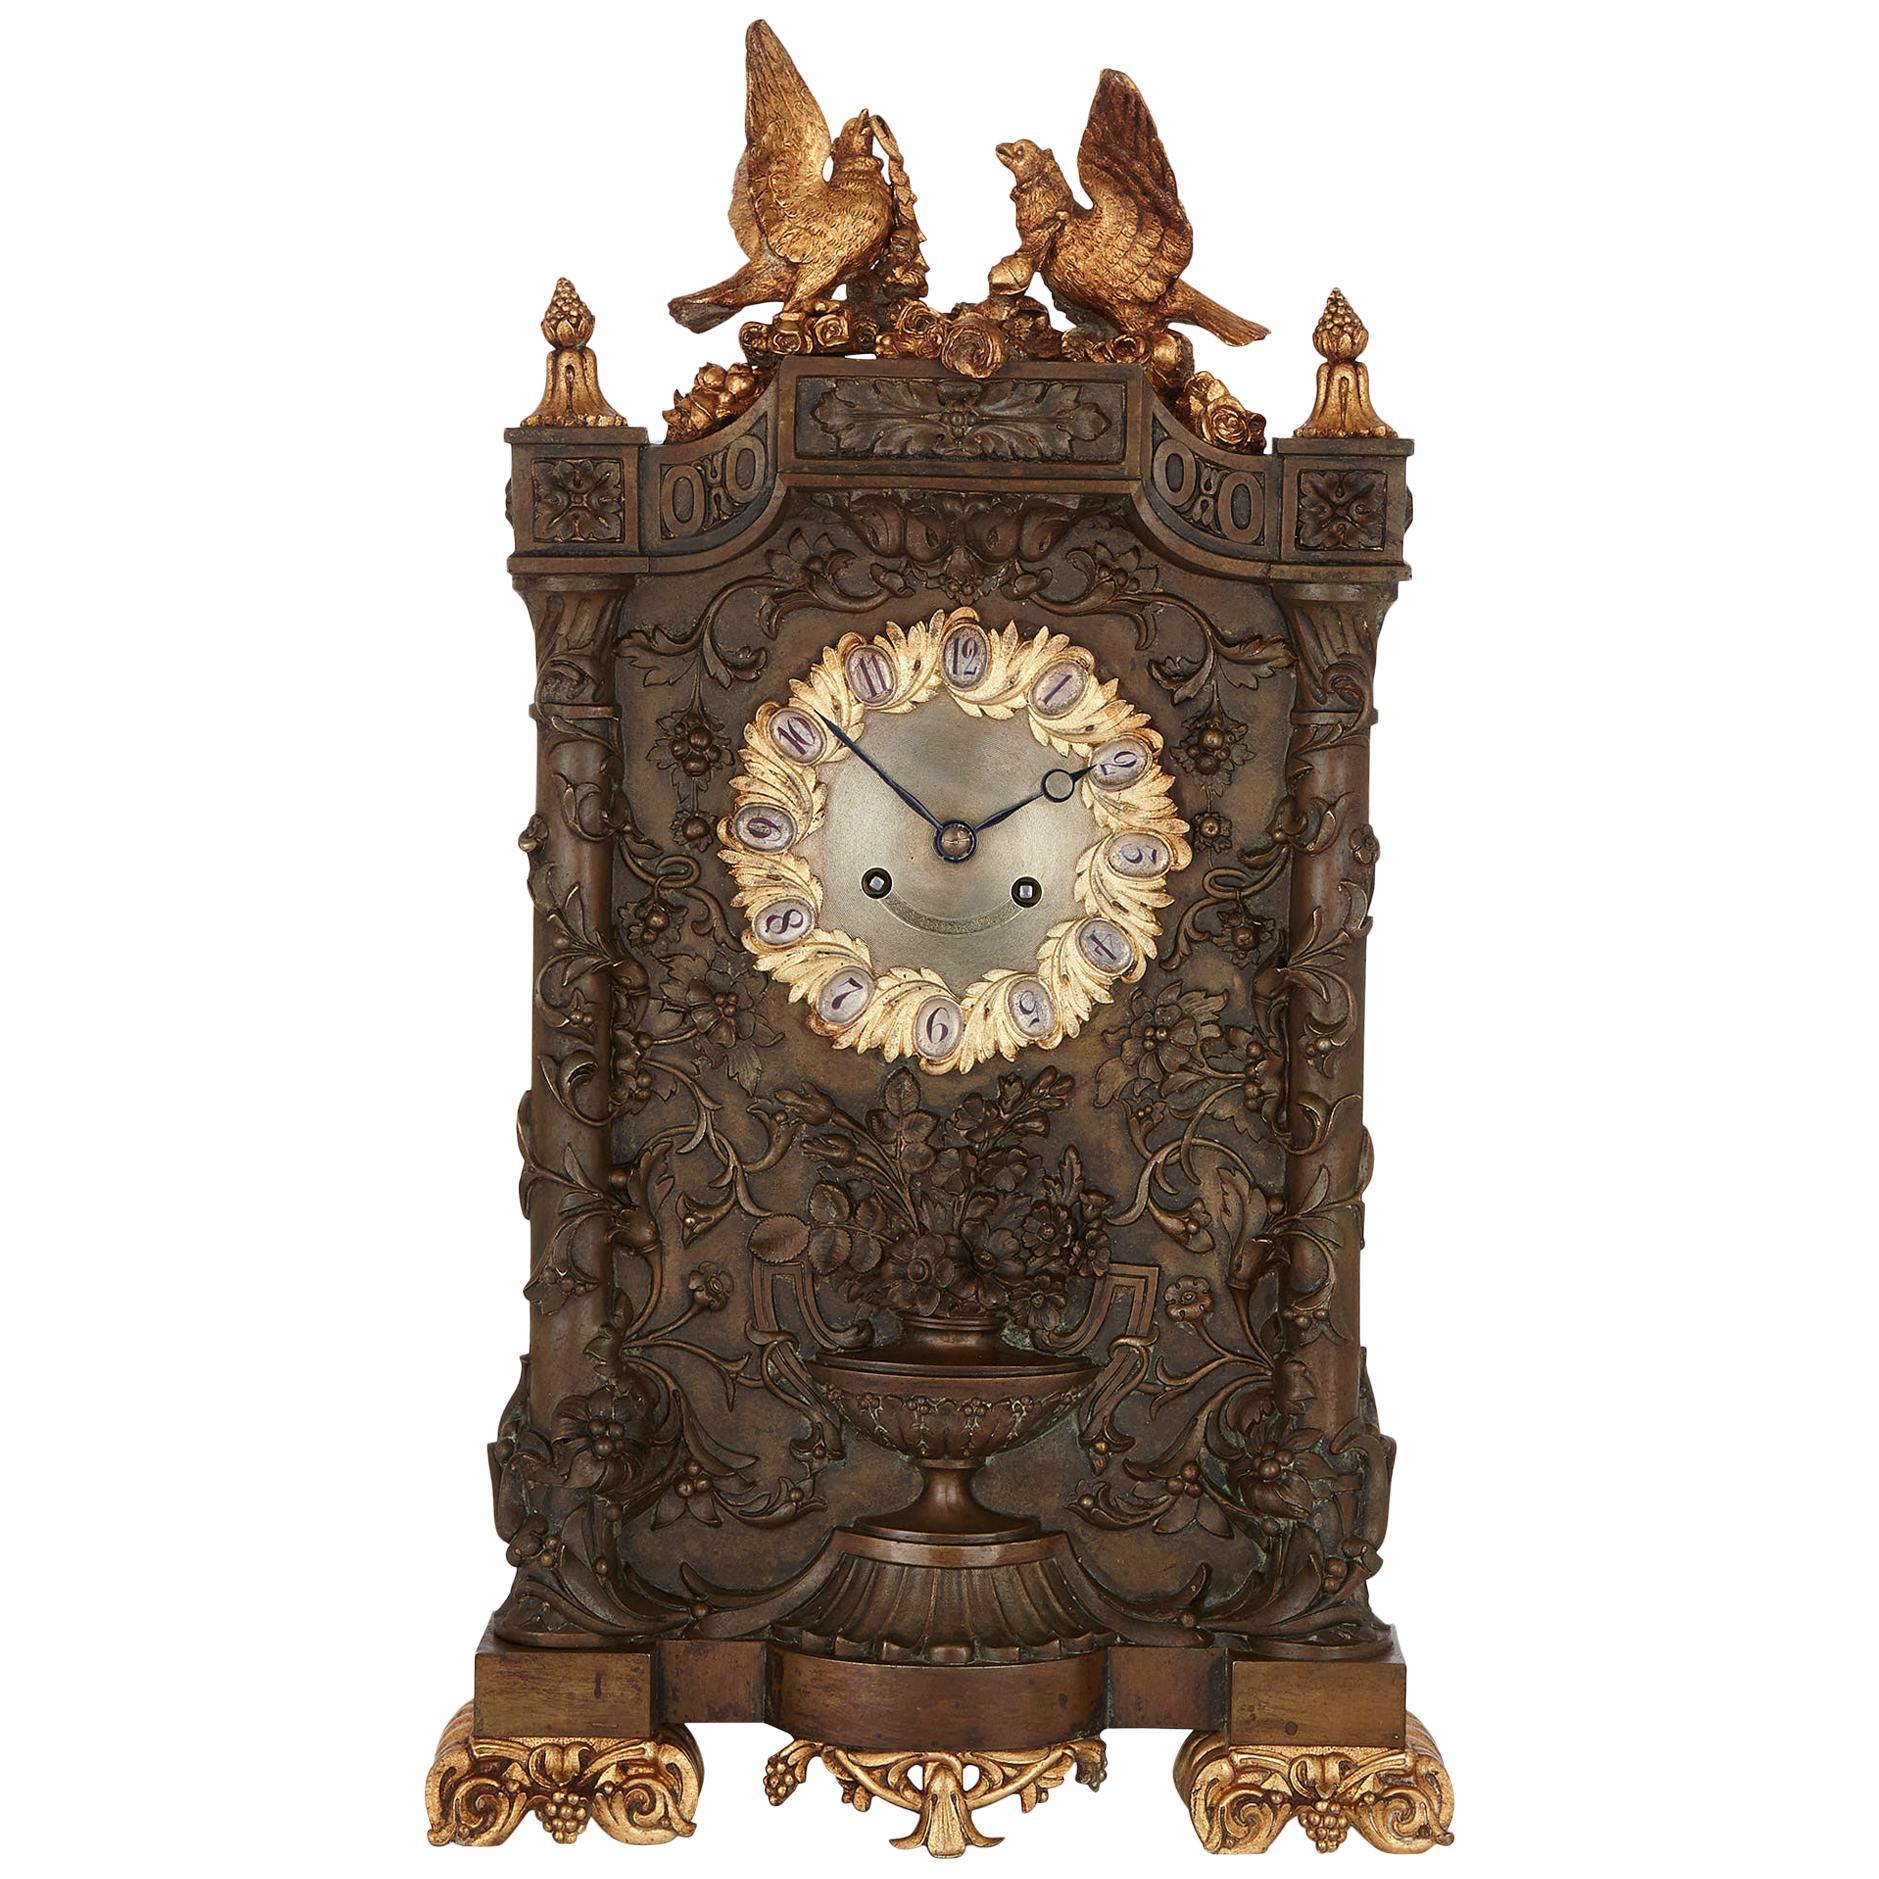 19th Century French Bronze Mantel Clock by Deniere & Fils